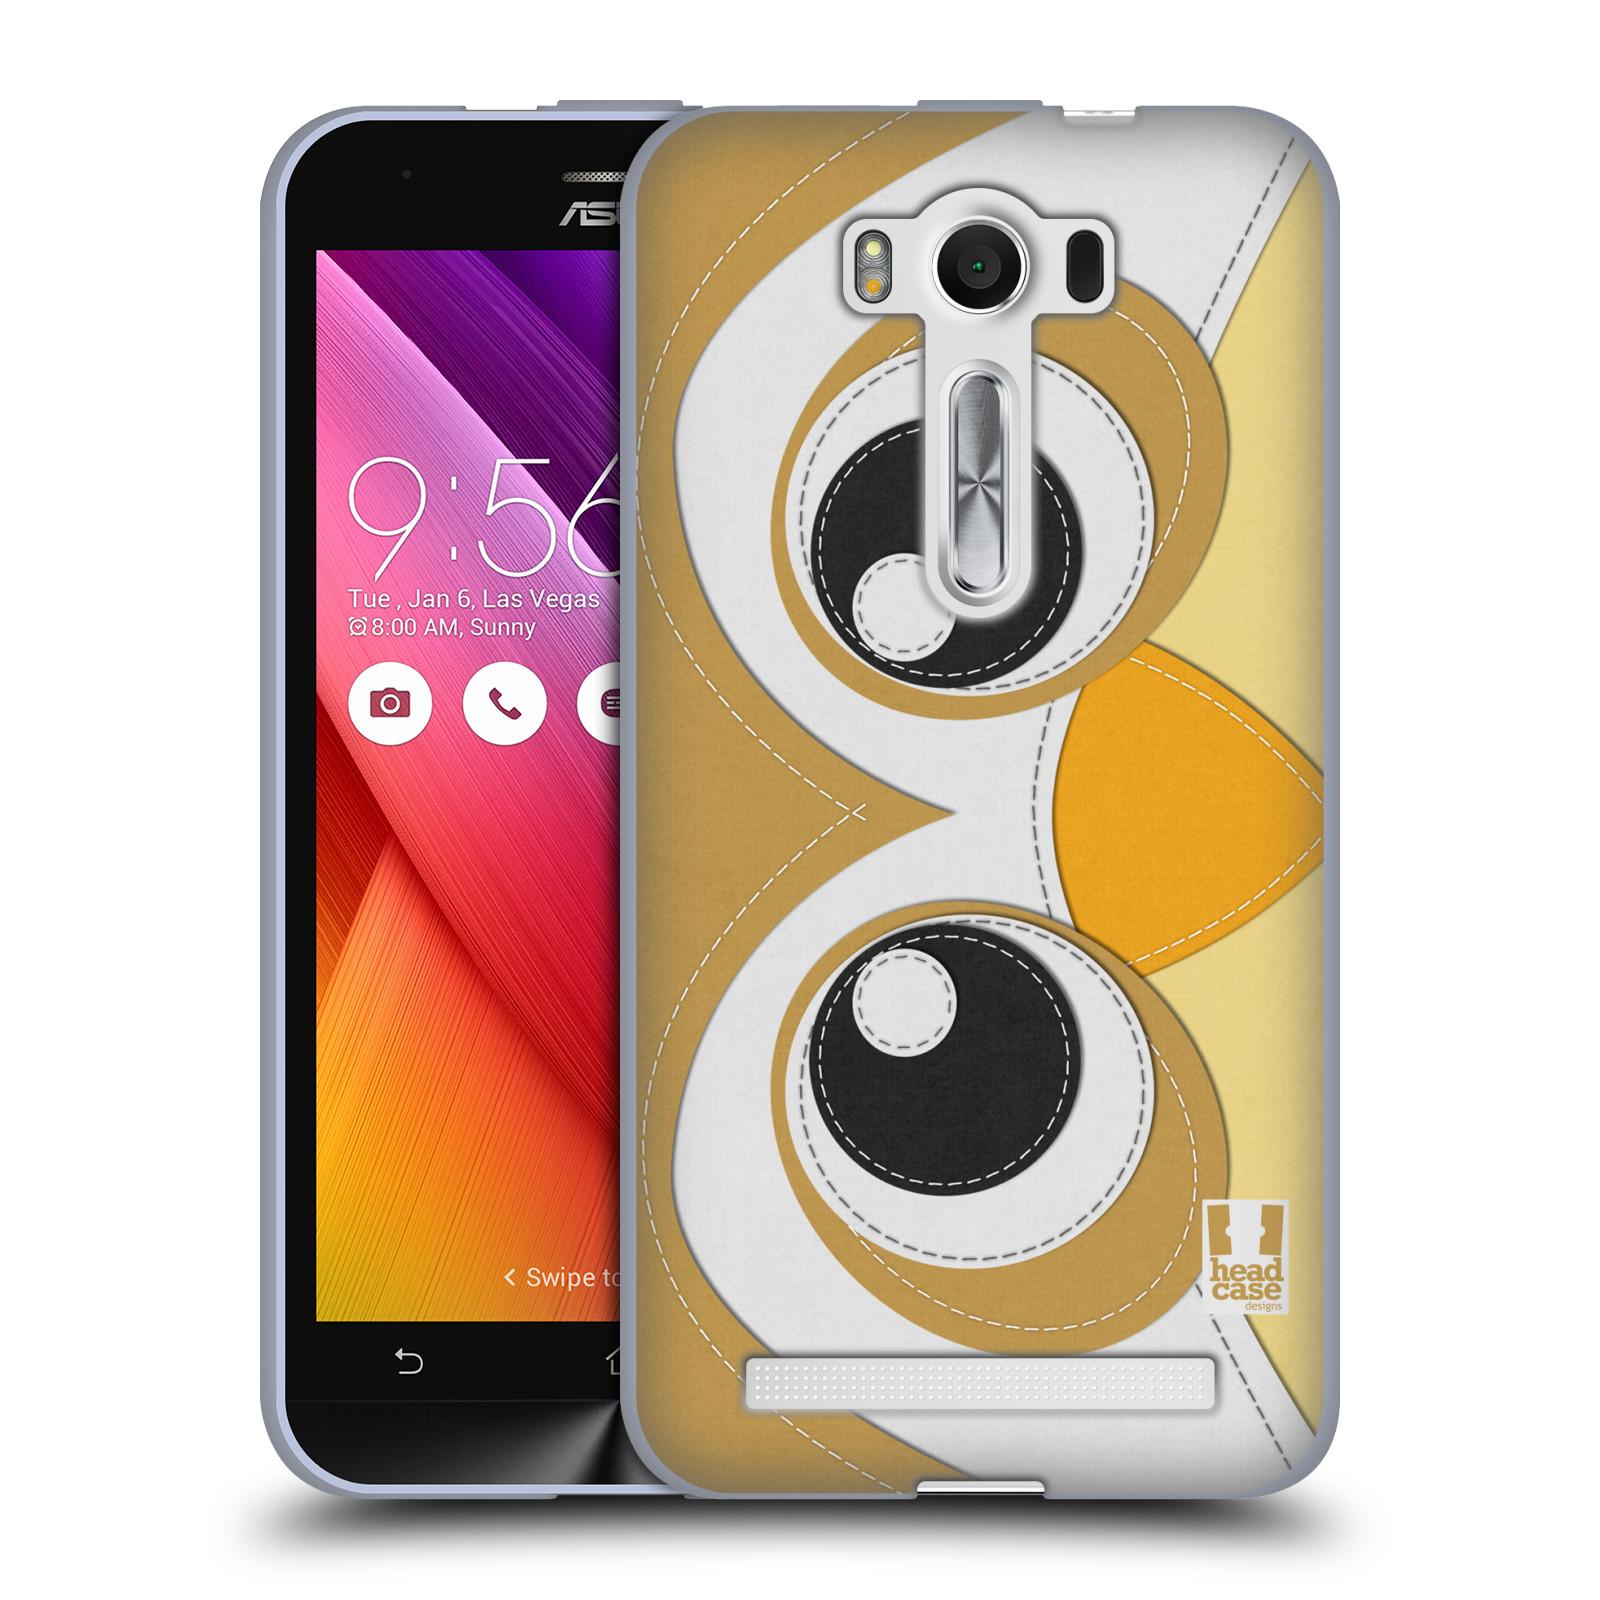 "HEAD CASE silikonový obal na mobil Asus Zenfone 2 LASER (ZE500KL s 5"" displejem) vzor zvířecí nášivka sovička"